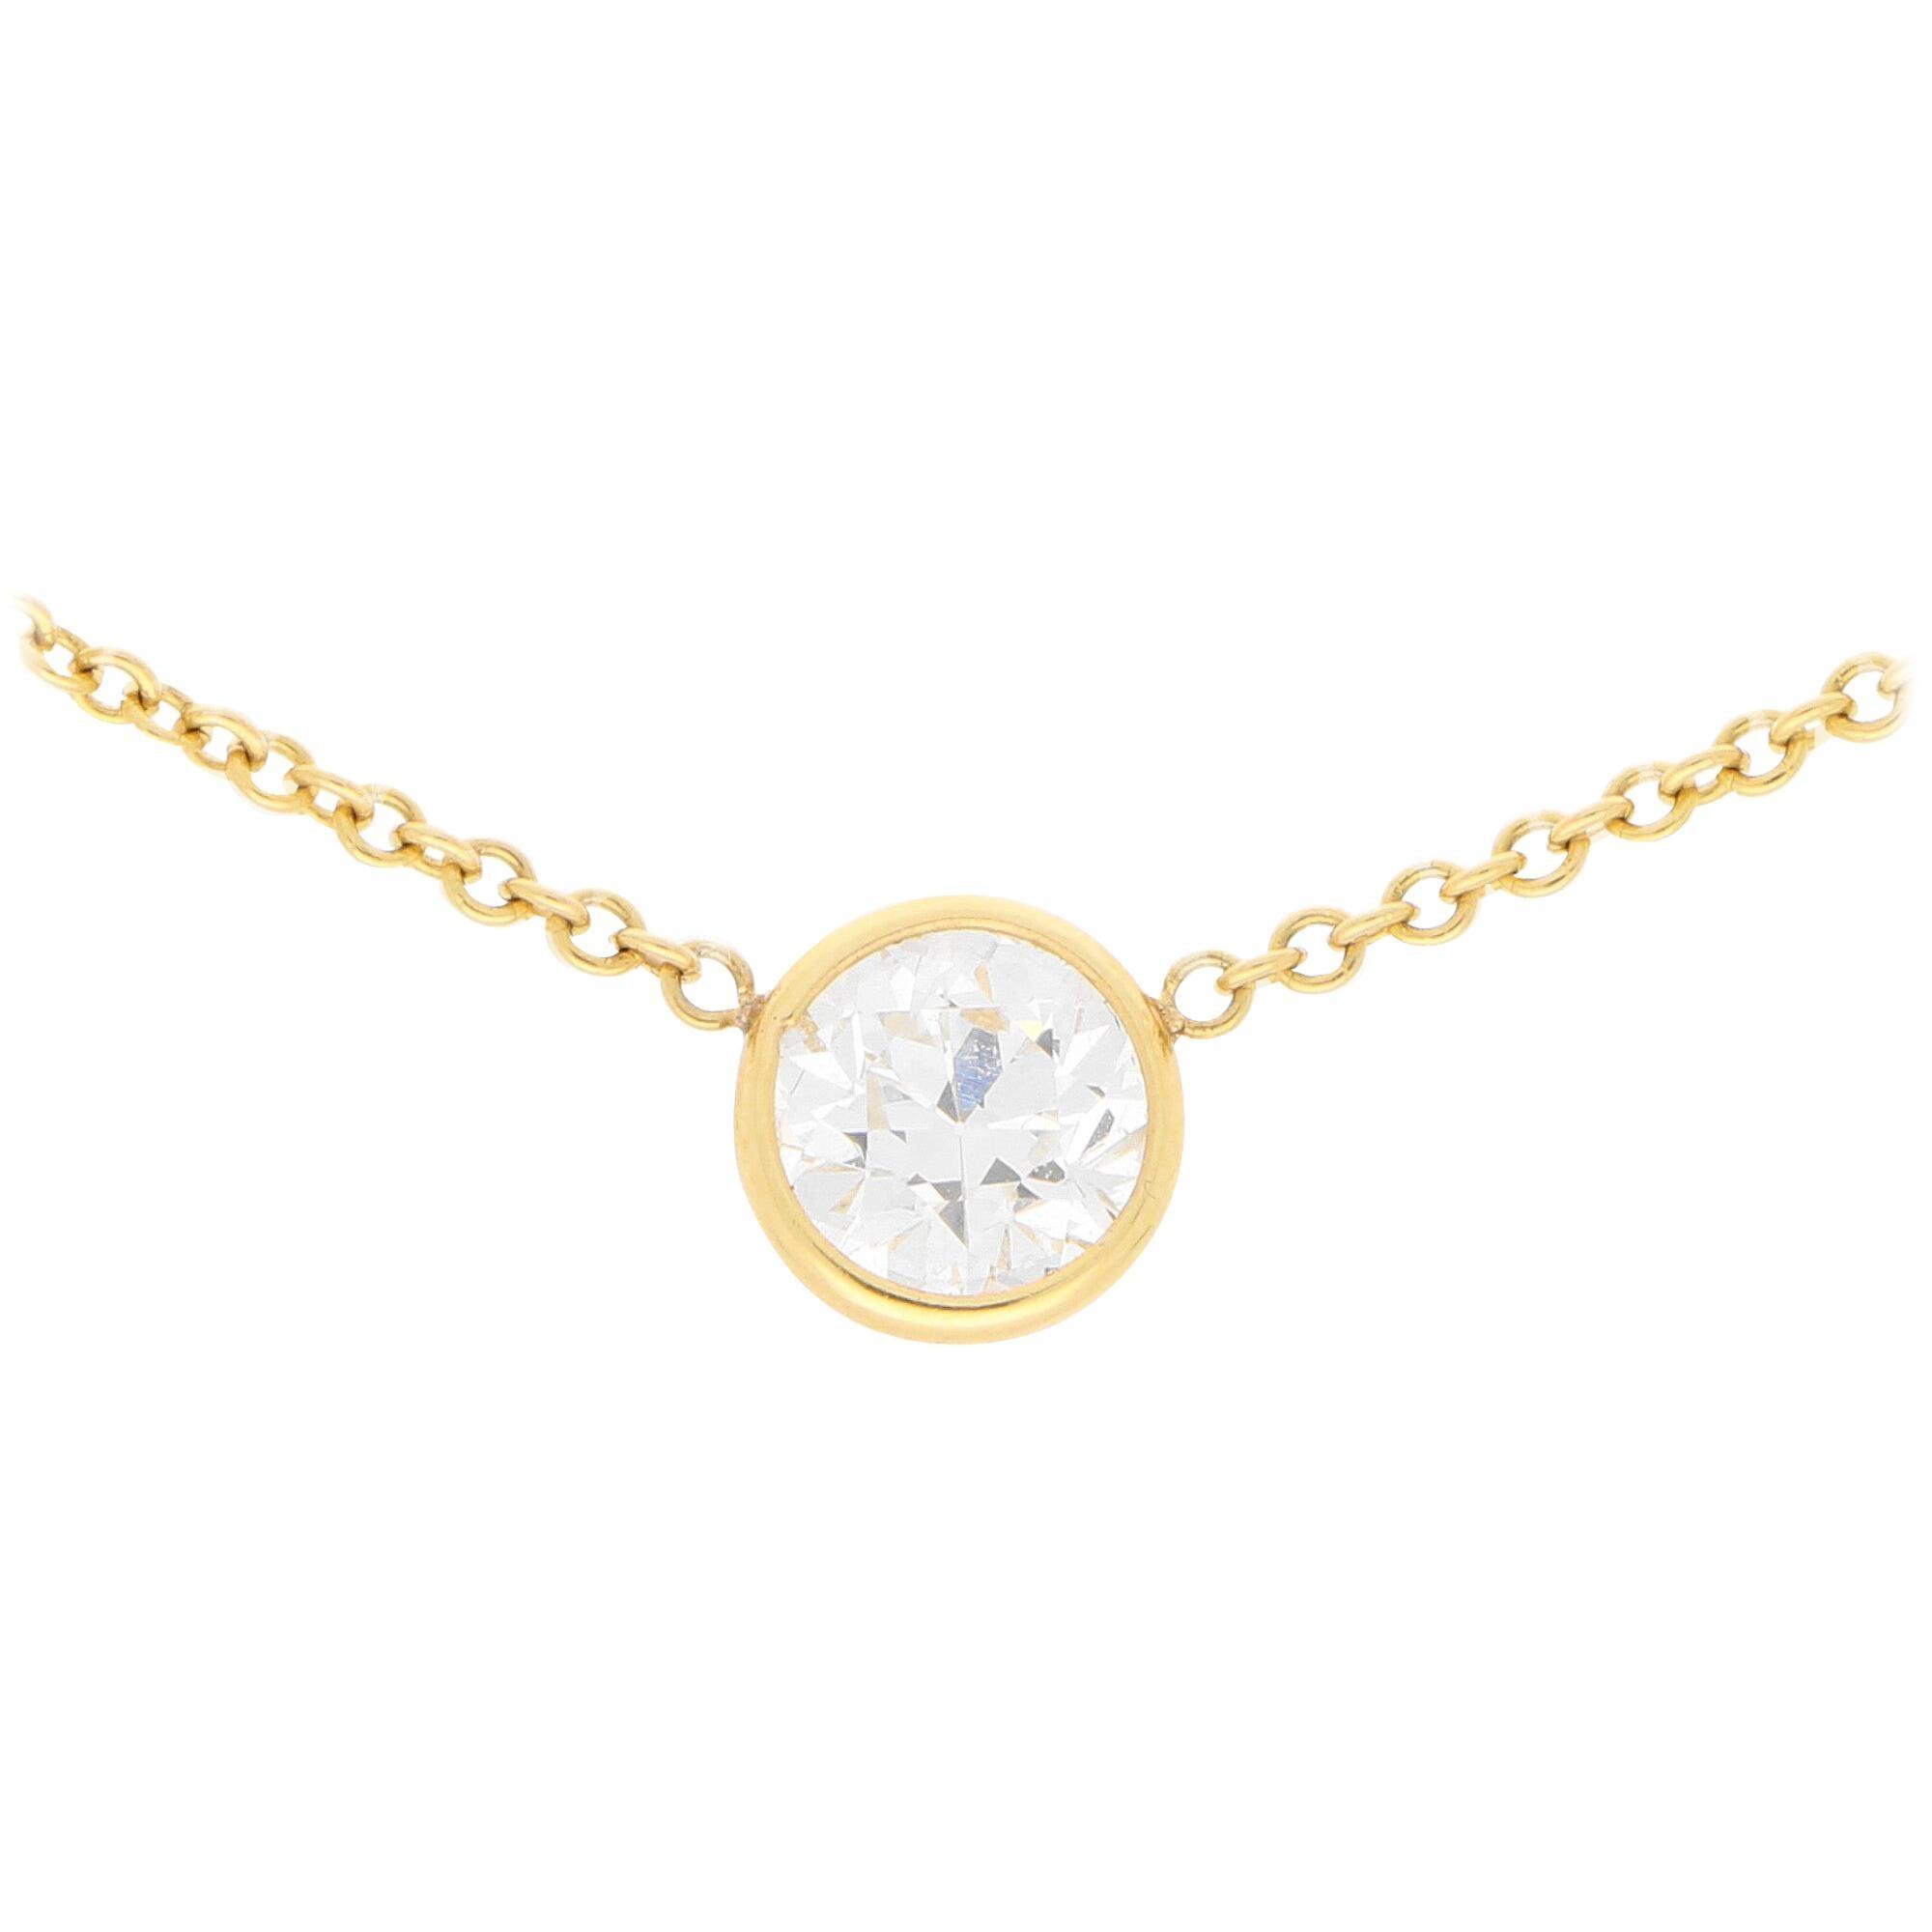 Round Brilliant Cut Diamond Single Stone Pendant in 18 Karat Yellow Gold